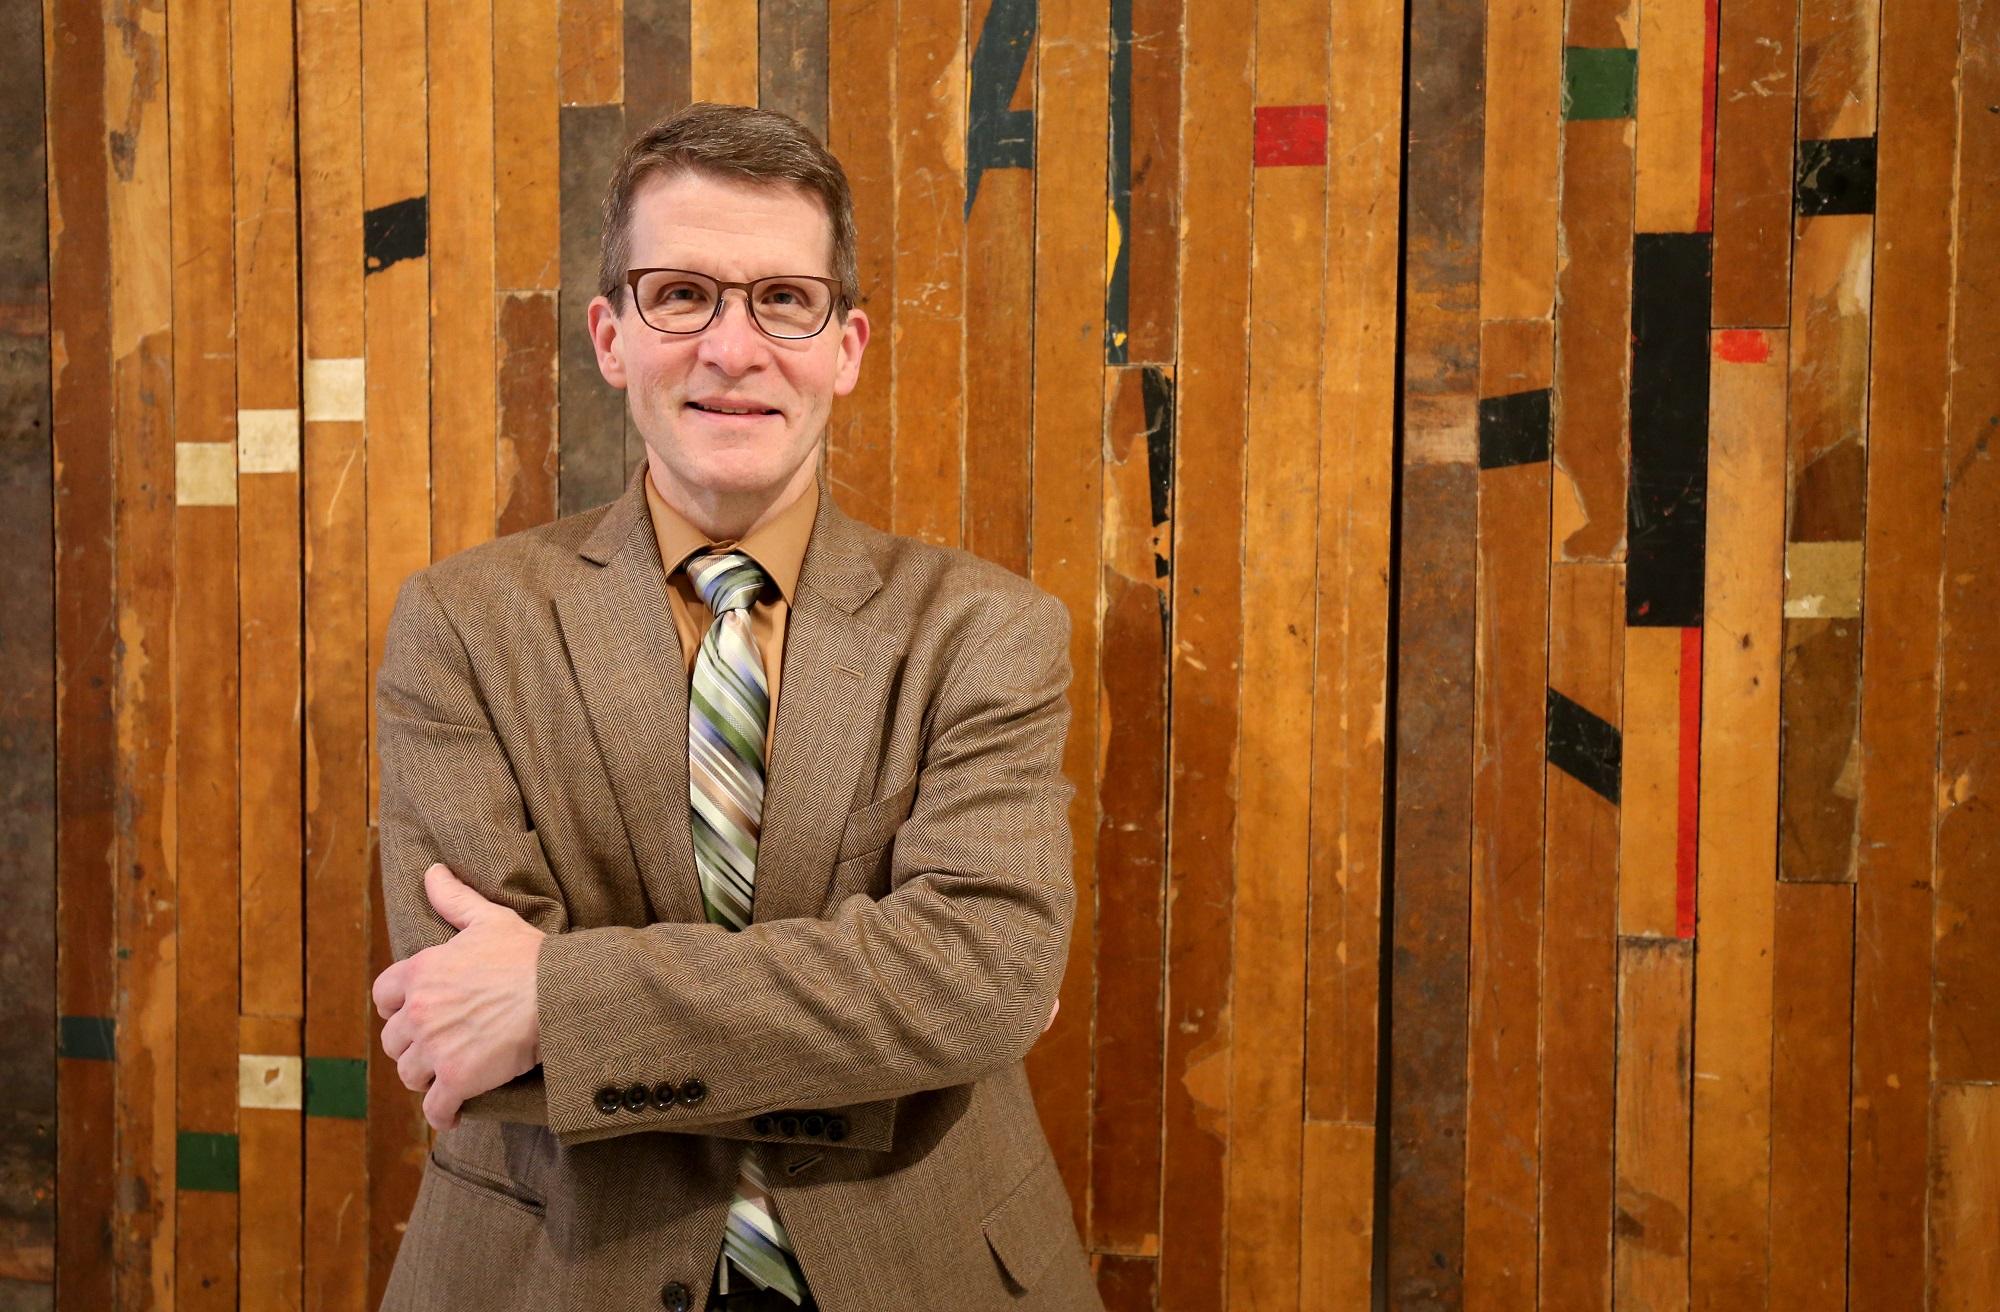 Smithsonian American Art Museum Names David Voyles Deputy Director